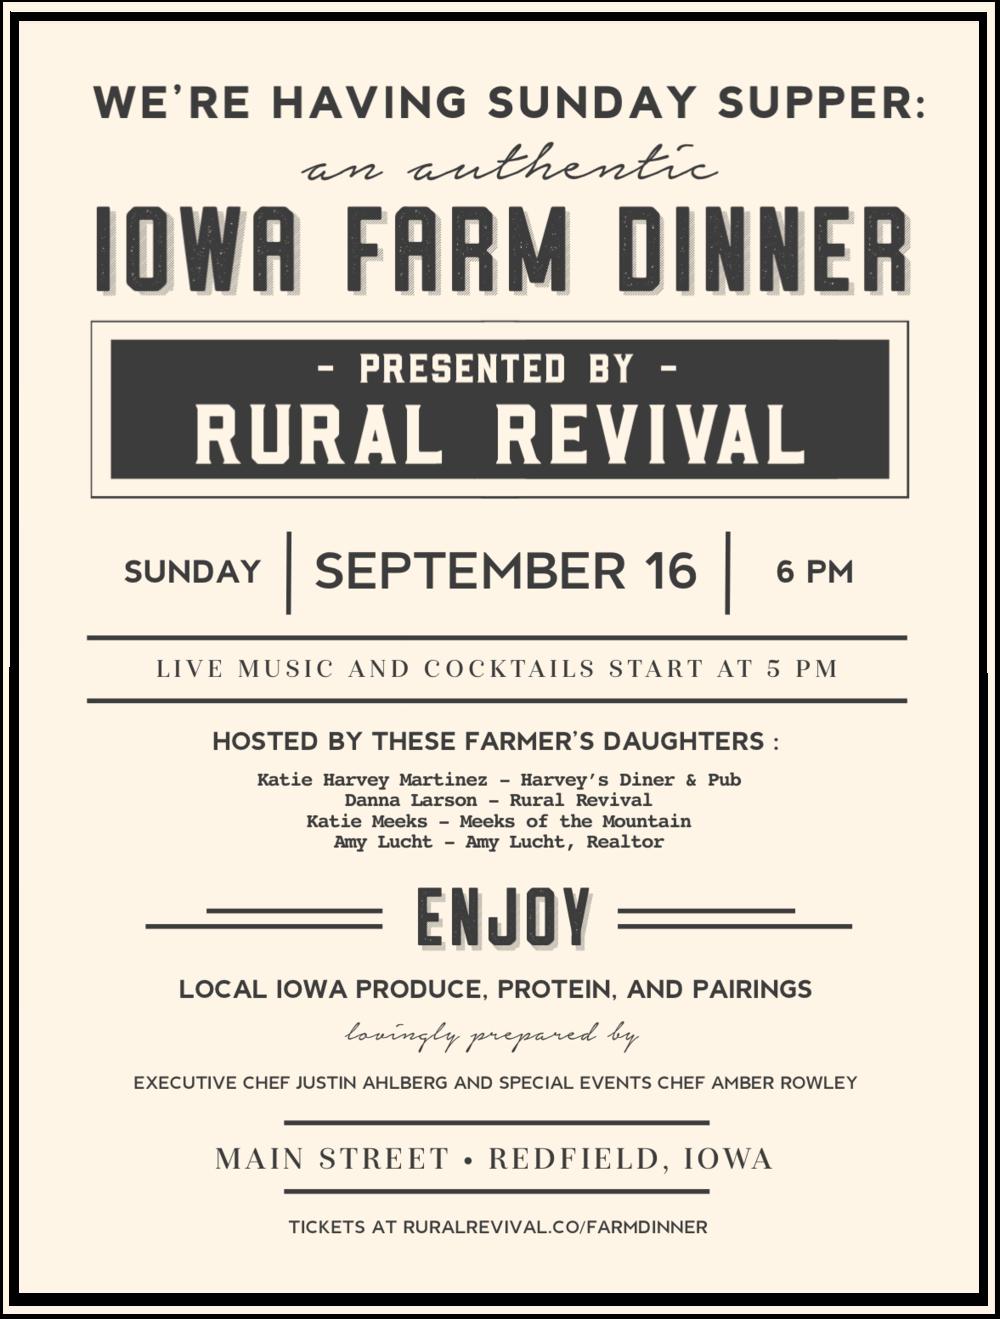 Iowa Farm Dinner Invite Final.png